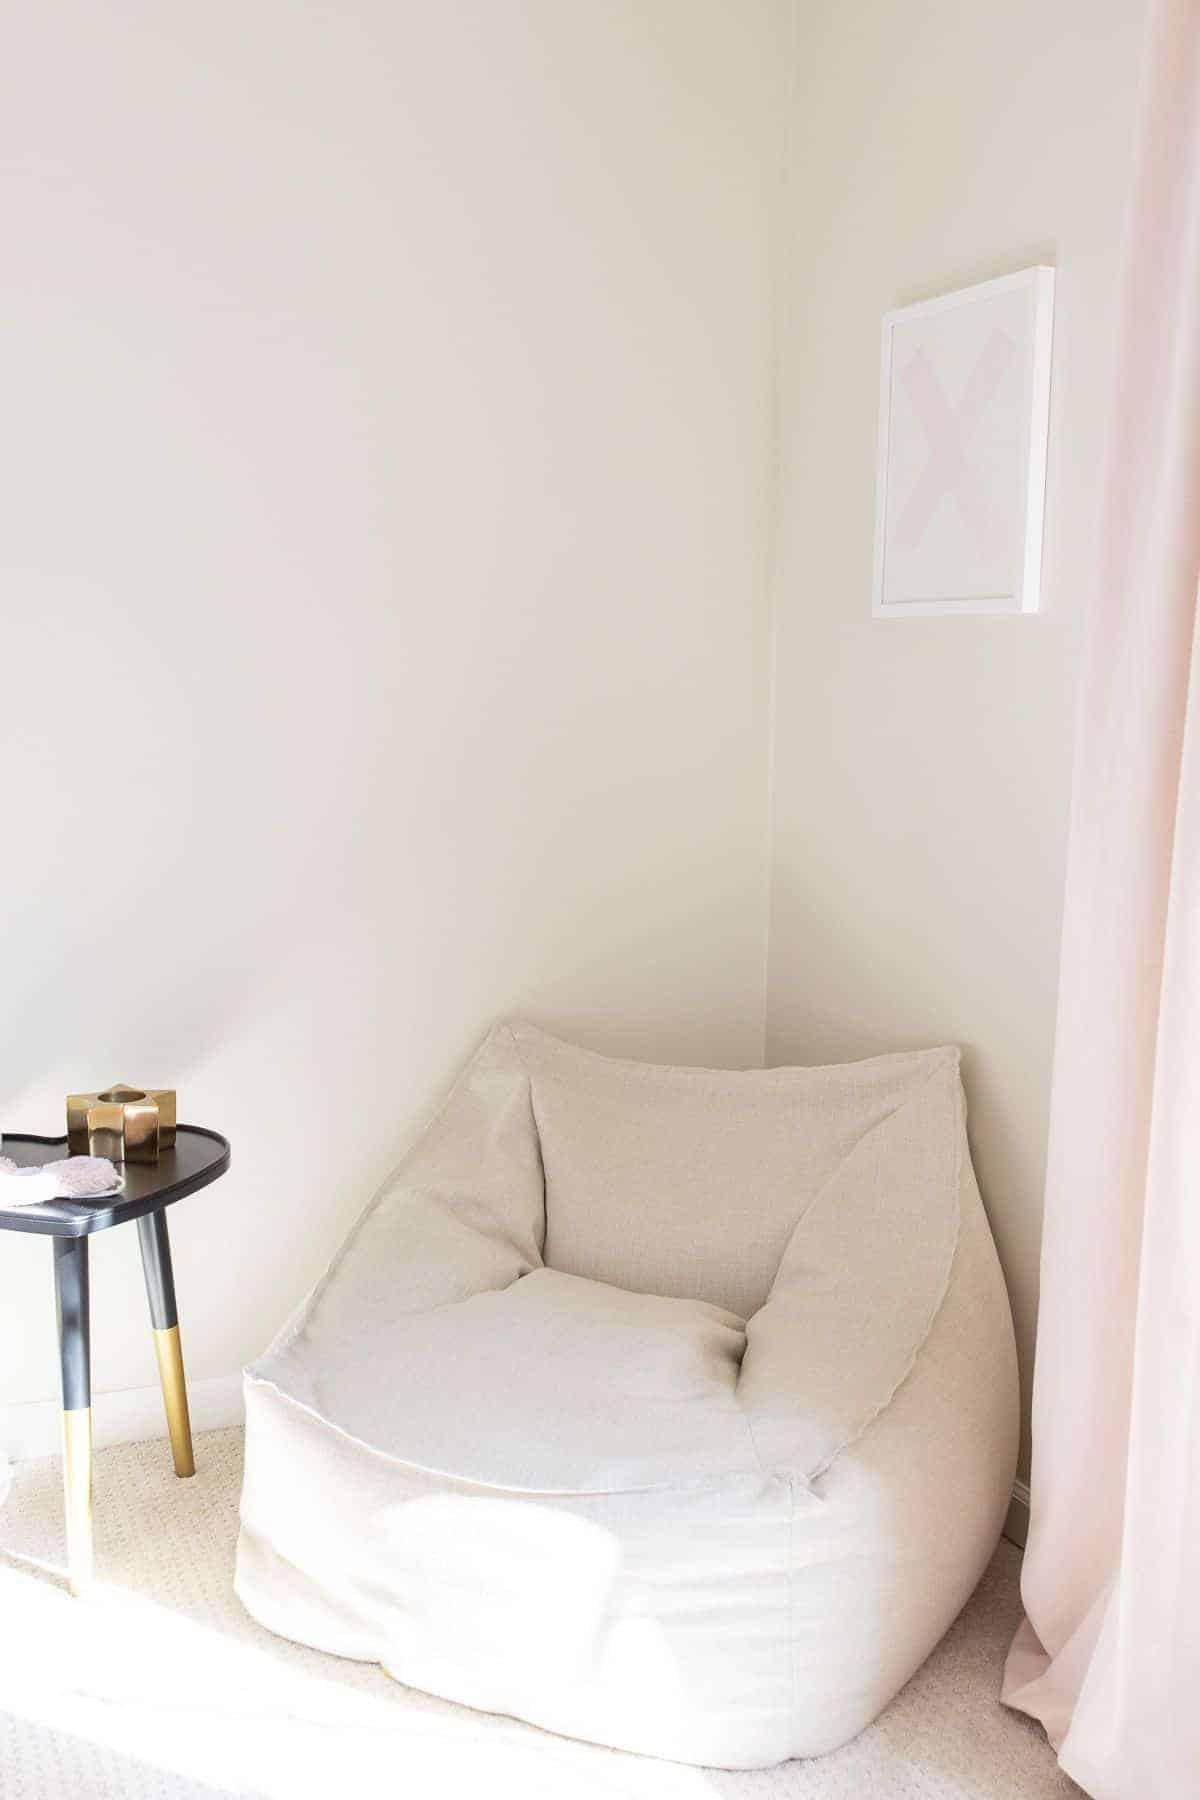 A tween bedroom idea of a white lounge chair in the corner of a tween bedroom.